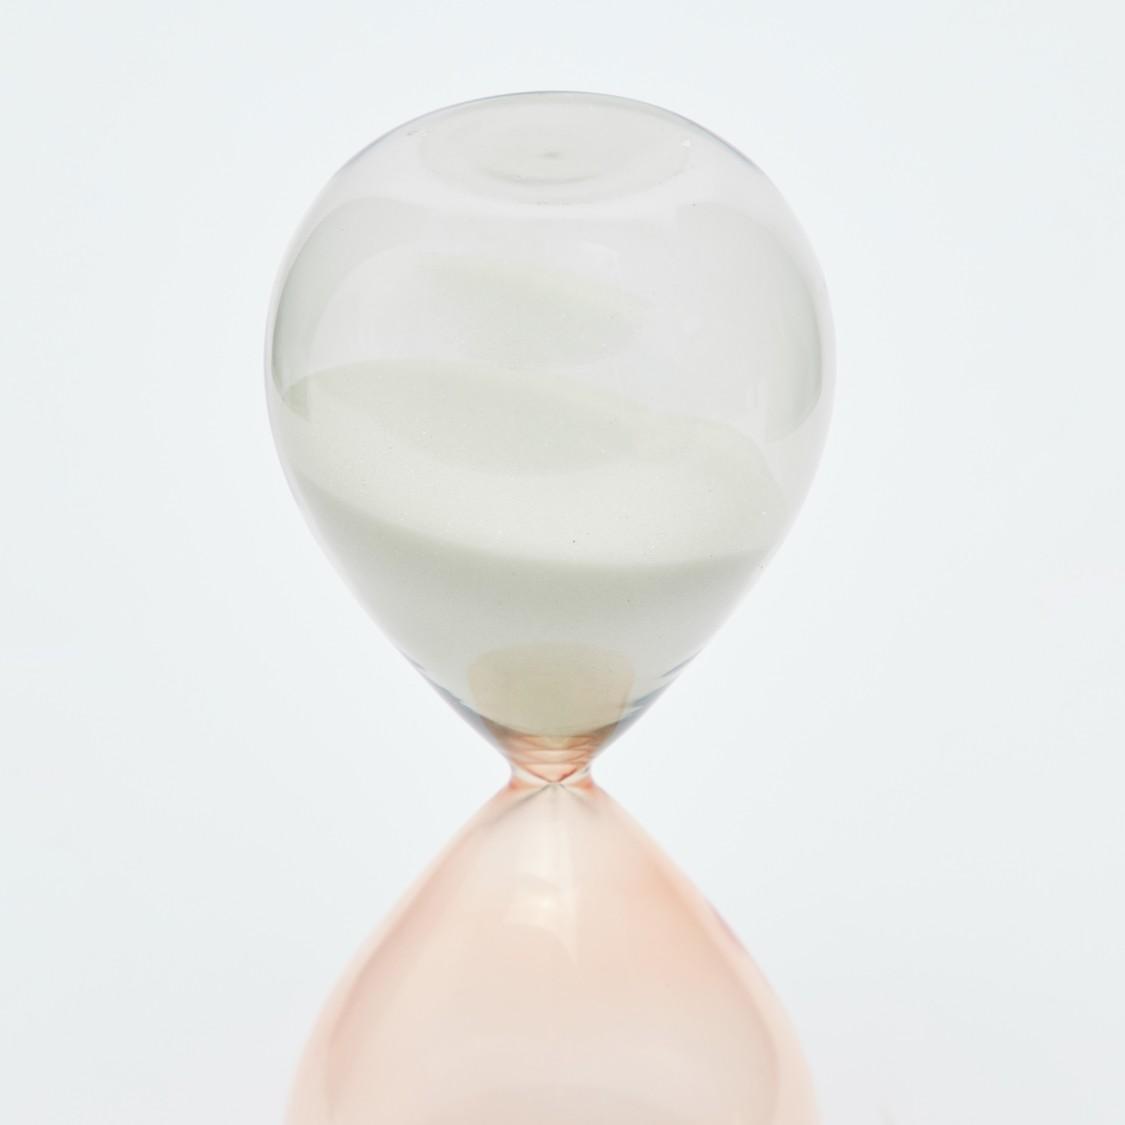 Dual Tone Hourglass Decor